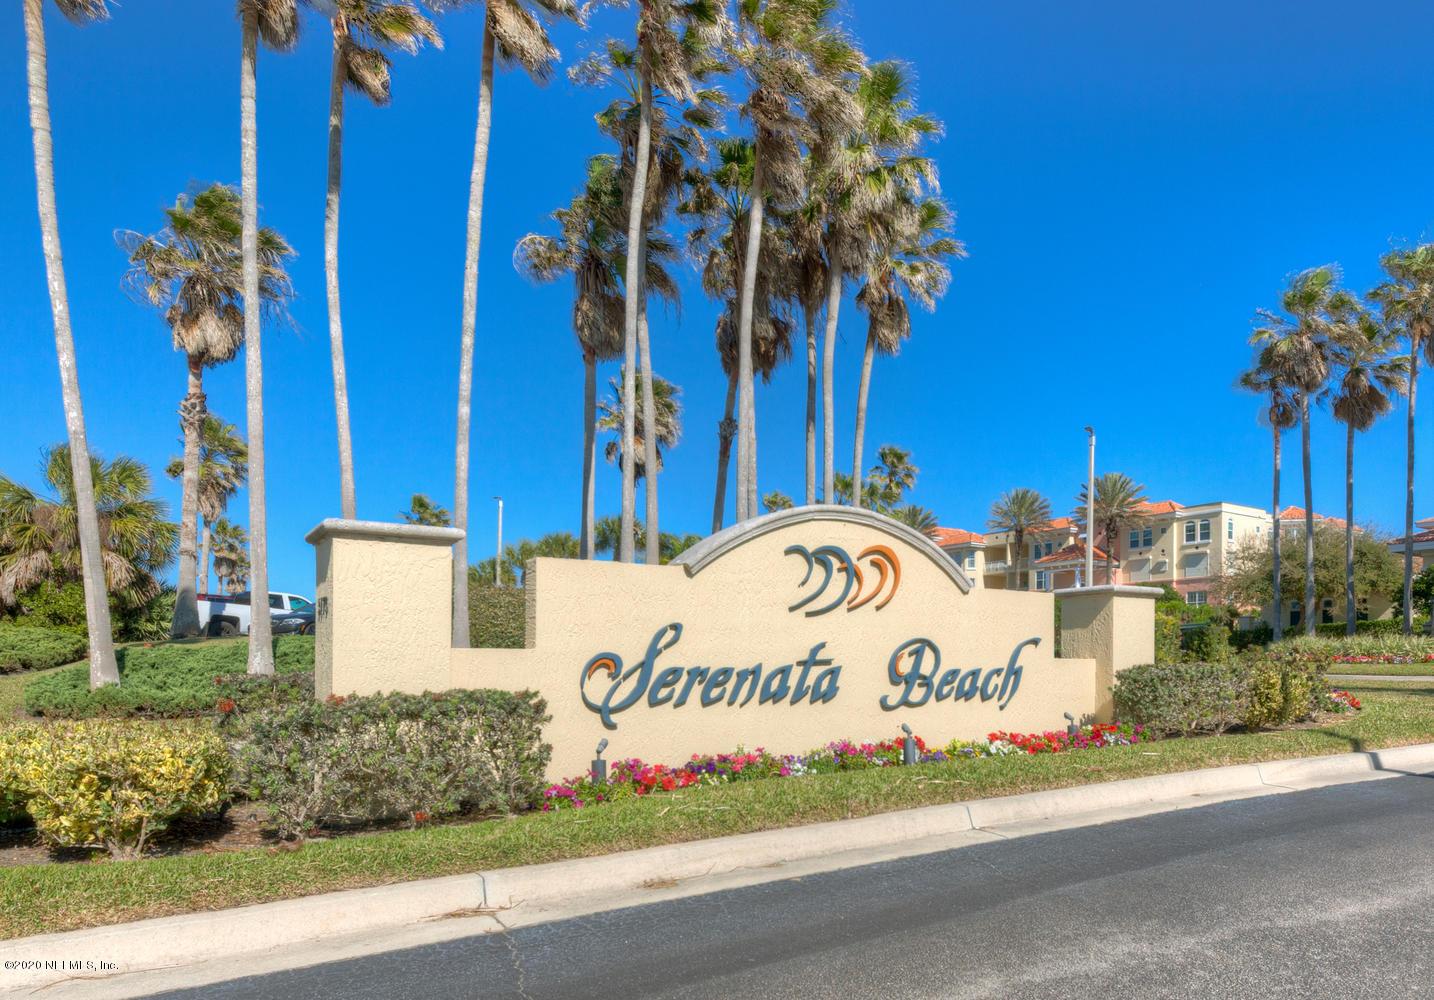 140 SERENATA, PONTE VEDRA BEACH, FLORIDA 32082, 3 Bedrooms Bedrooms, ,3 BathroomsBathrooms,Residential,For sale,SERENATA,1040456